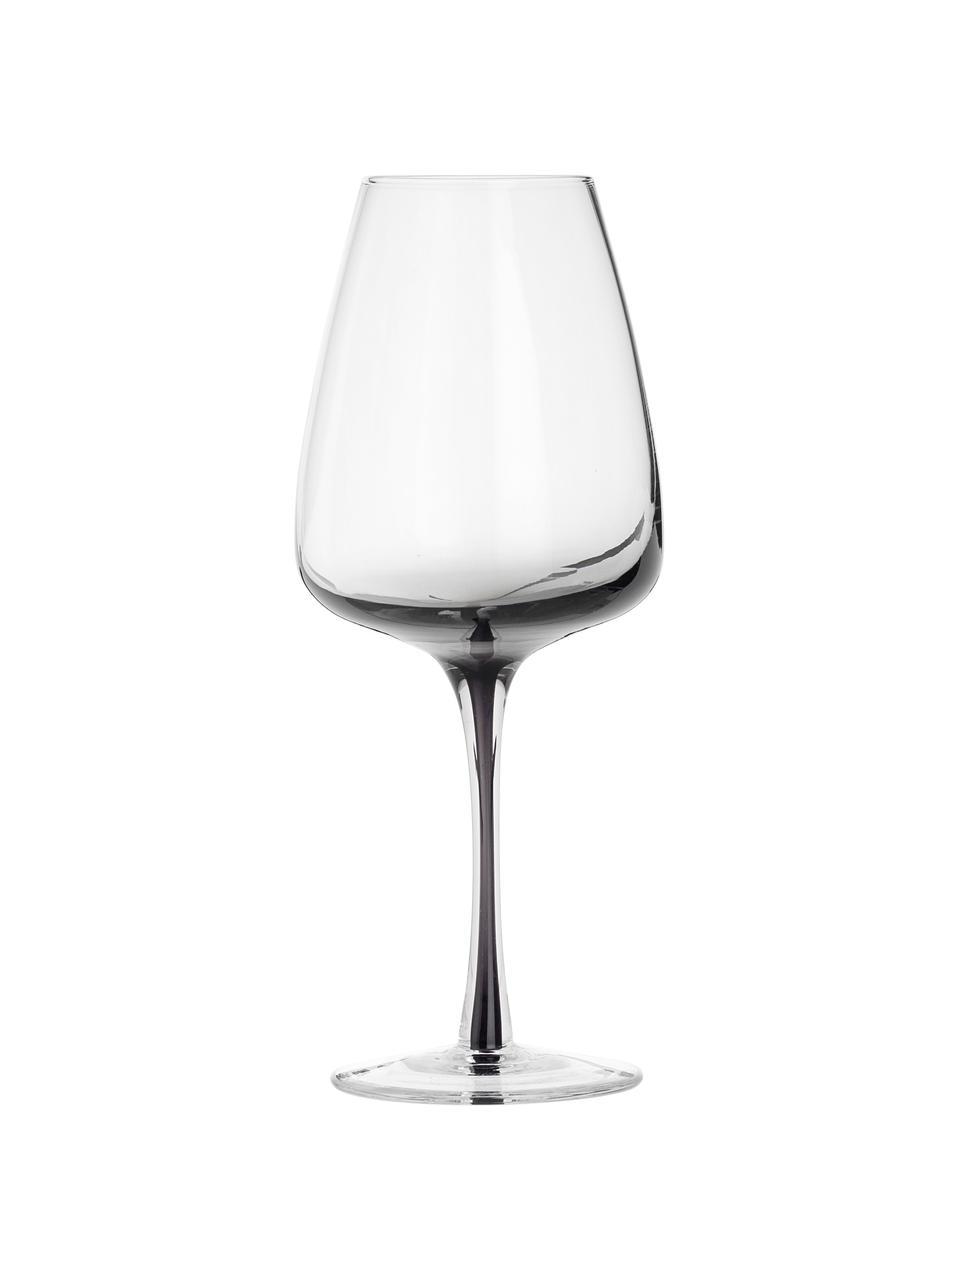 Mondgeblazen wijnglazen Smoke, 4 stuks, Glas, mondgeblazen, Fumé, Ø 9 x H 21 cm